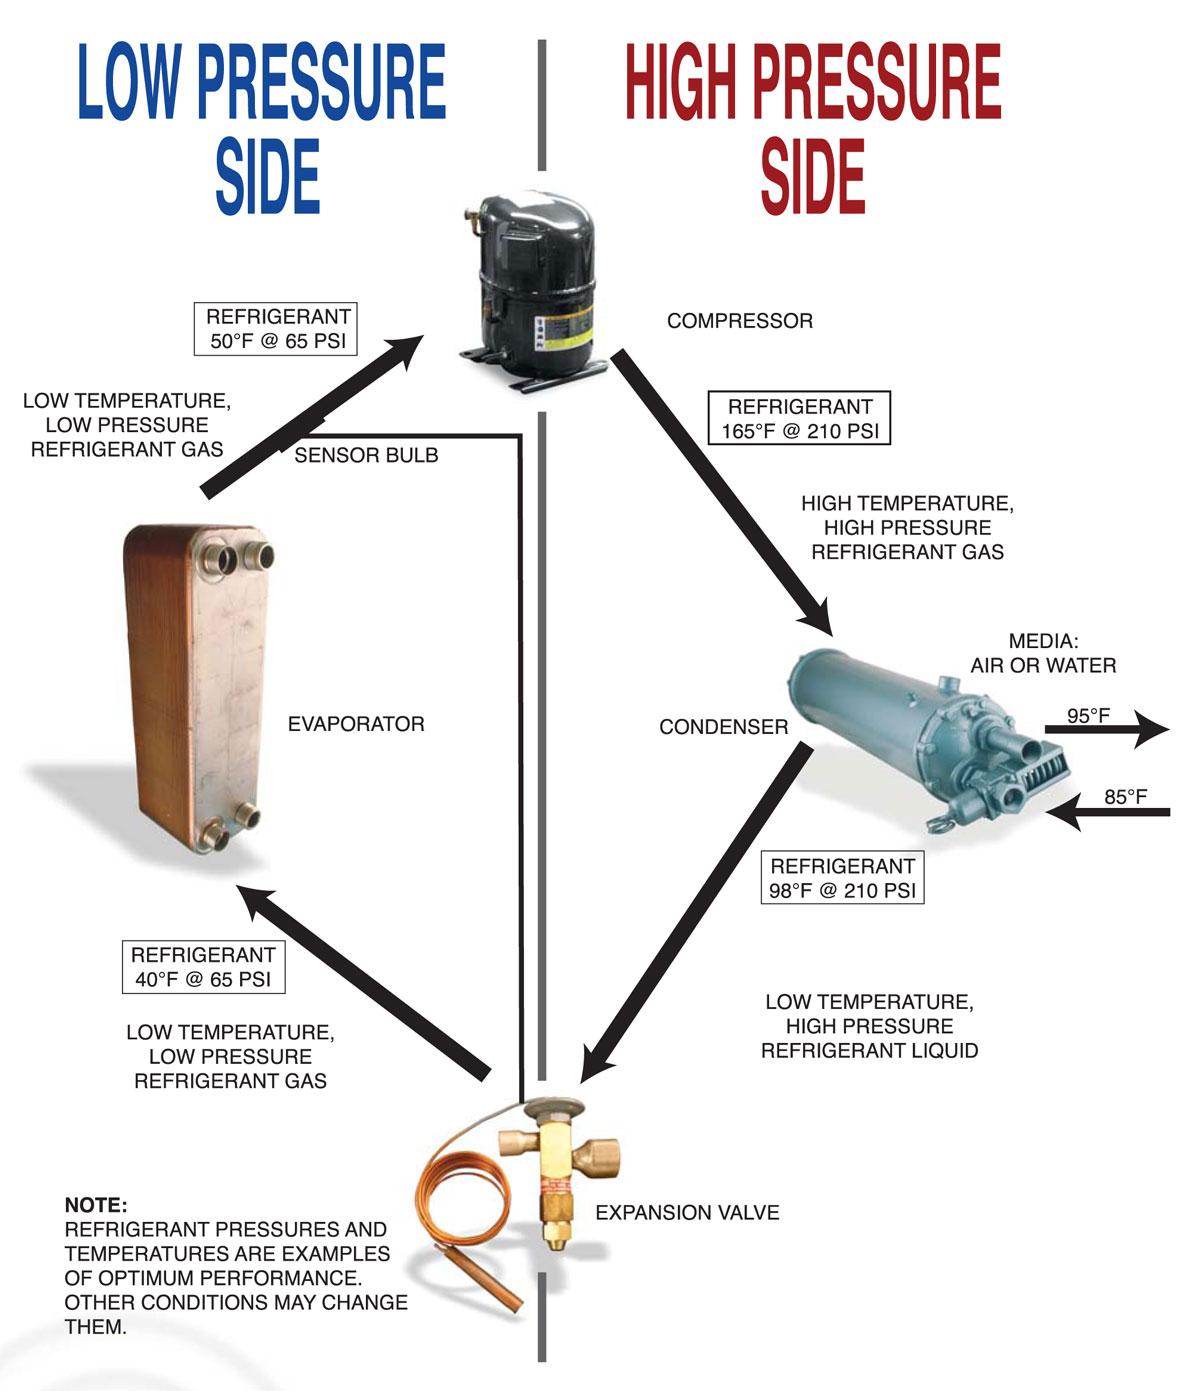 Basic Refrigerant Circuit With Pressure And Temperature